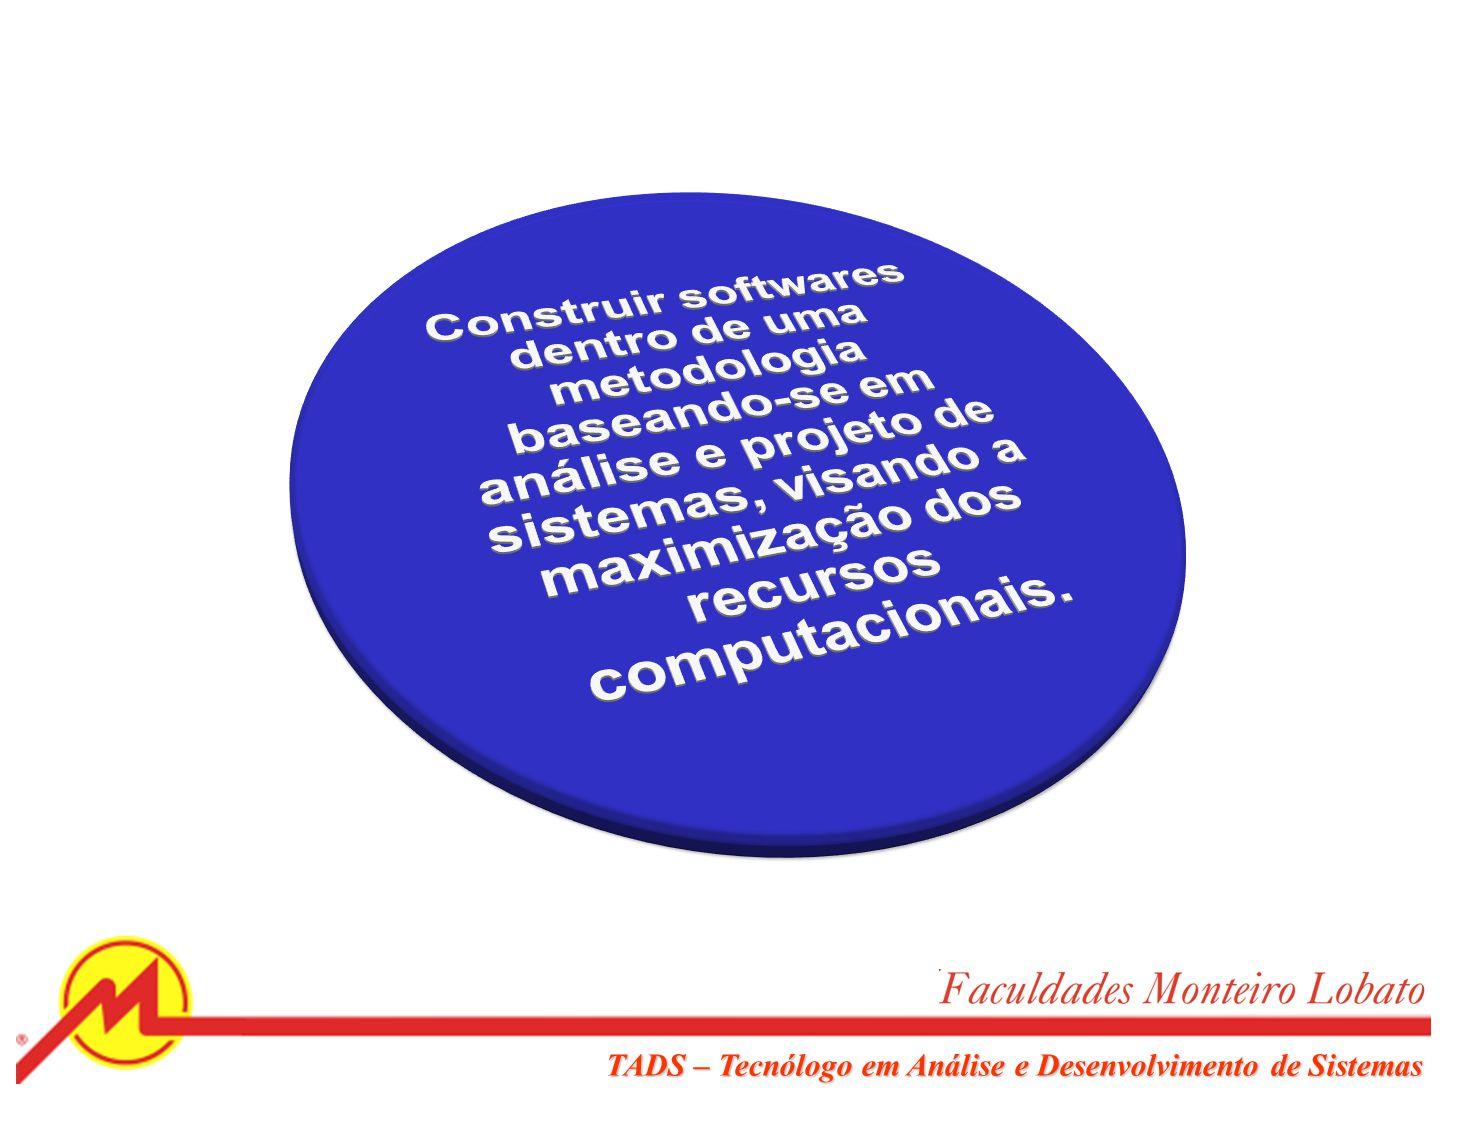 Indicar áreas potenciais de informática, aplicando princípios de empreendedorismo no exercício do trabalho.